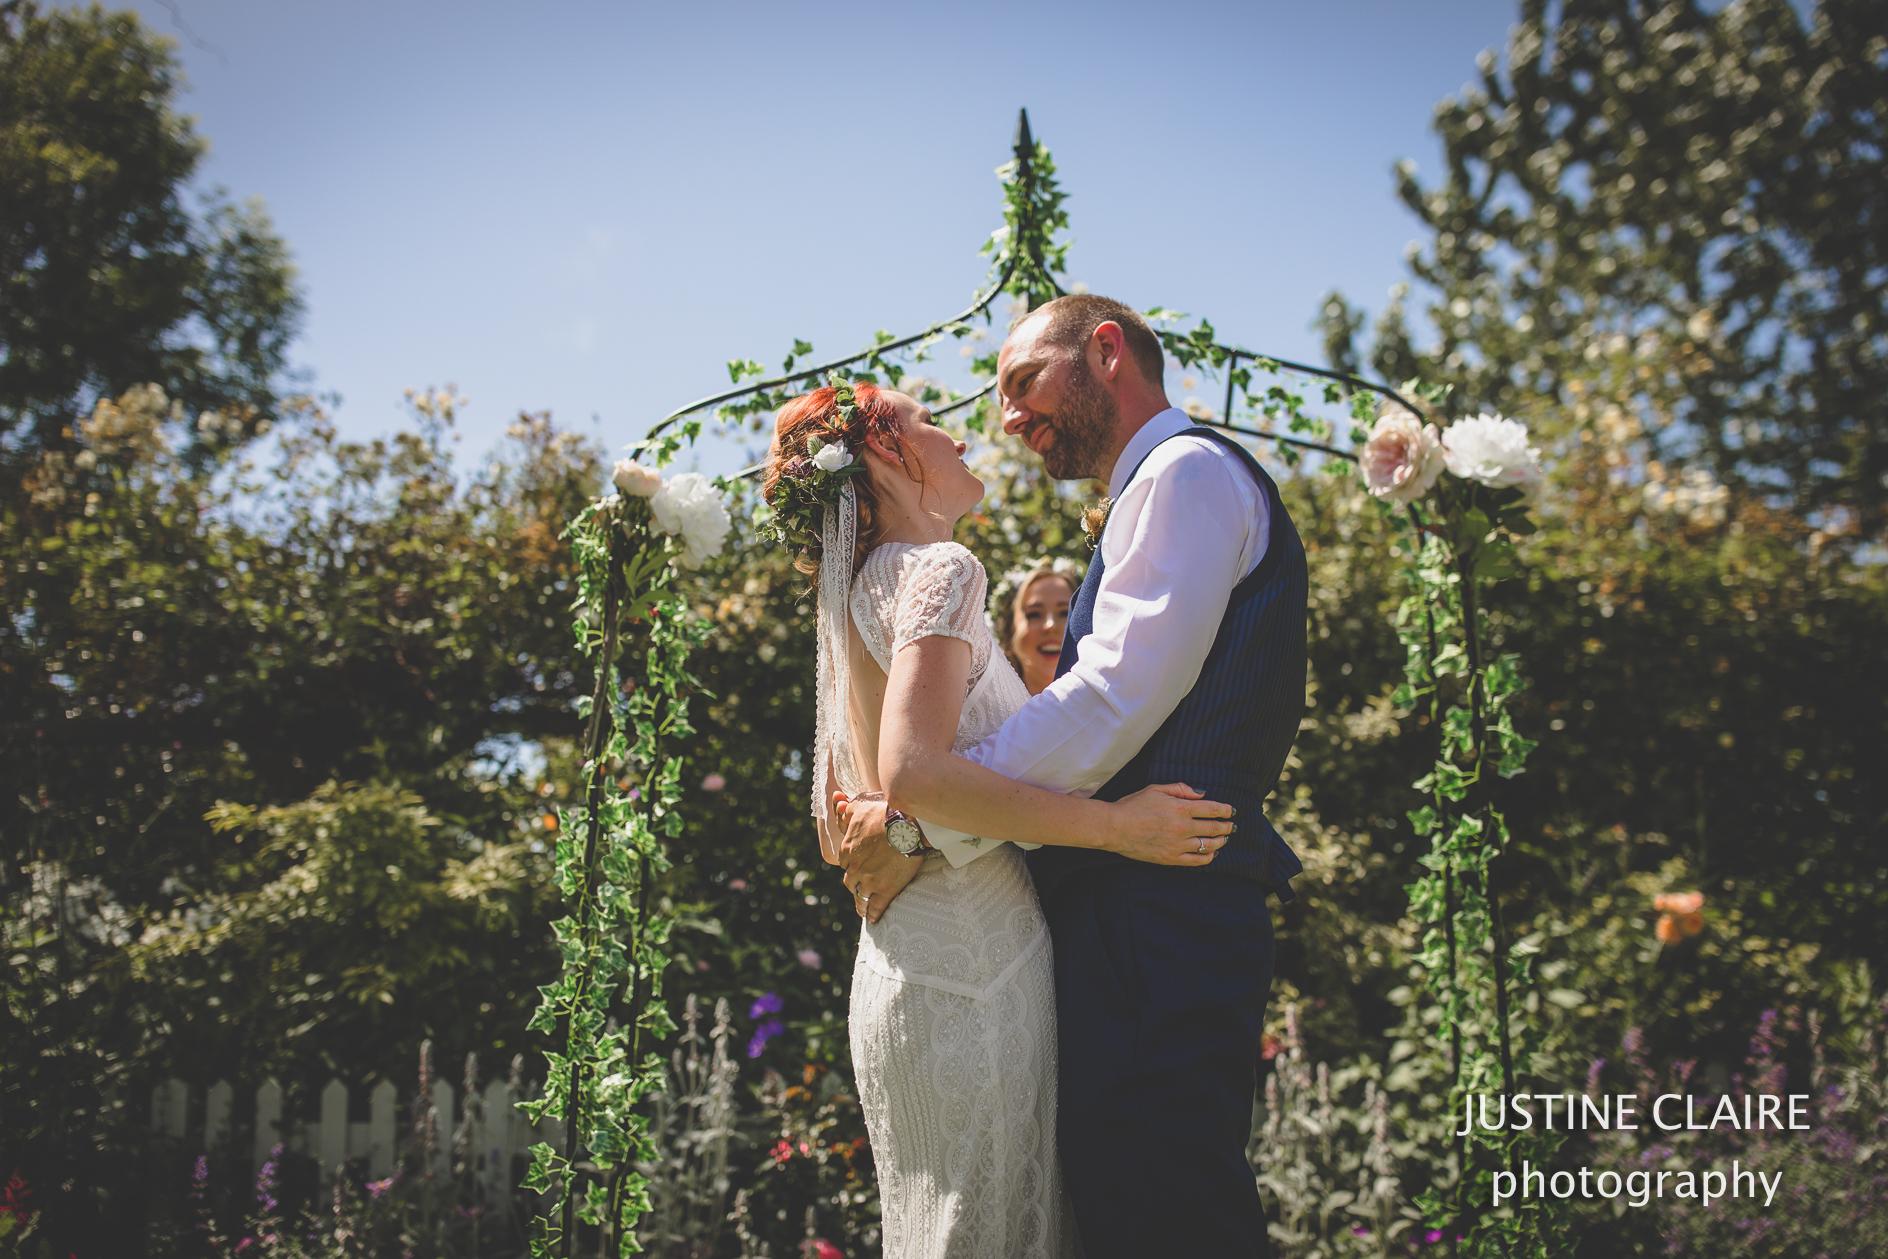 Rumbolds farm wedding photographers plaistow Billingshurst-7-4.jpg